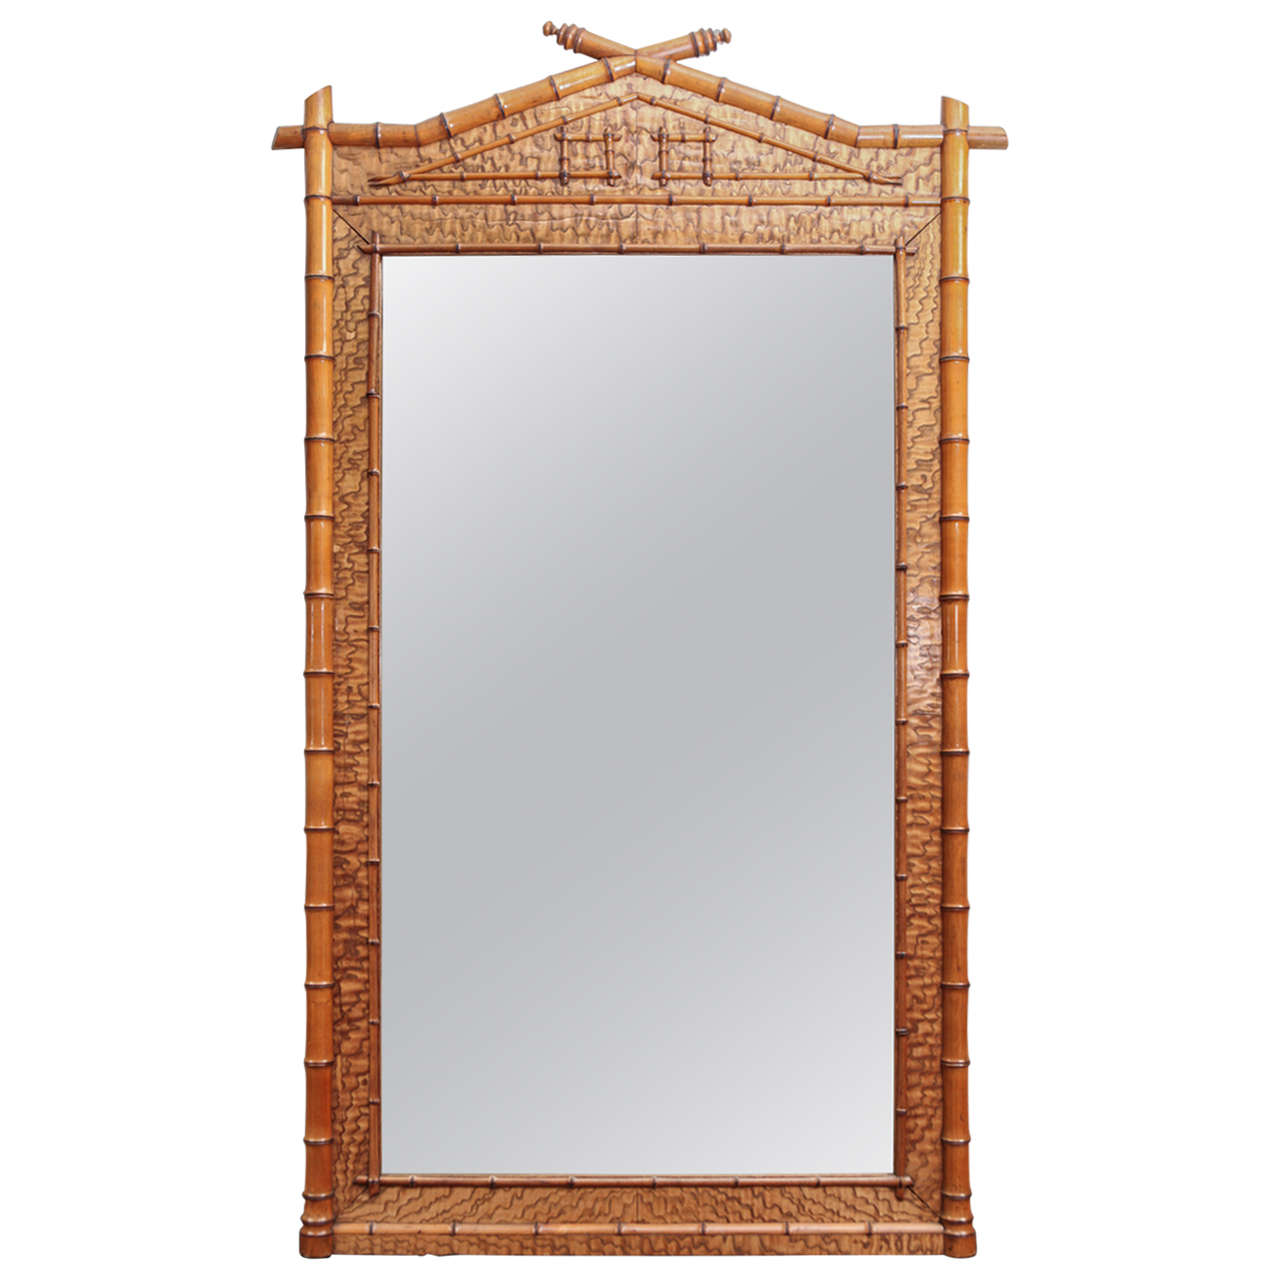 Early 19th Century Bamboo Mirror